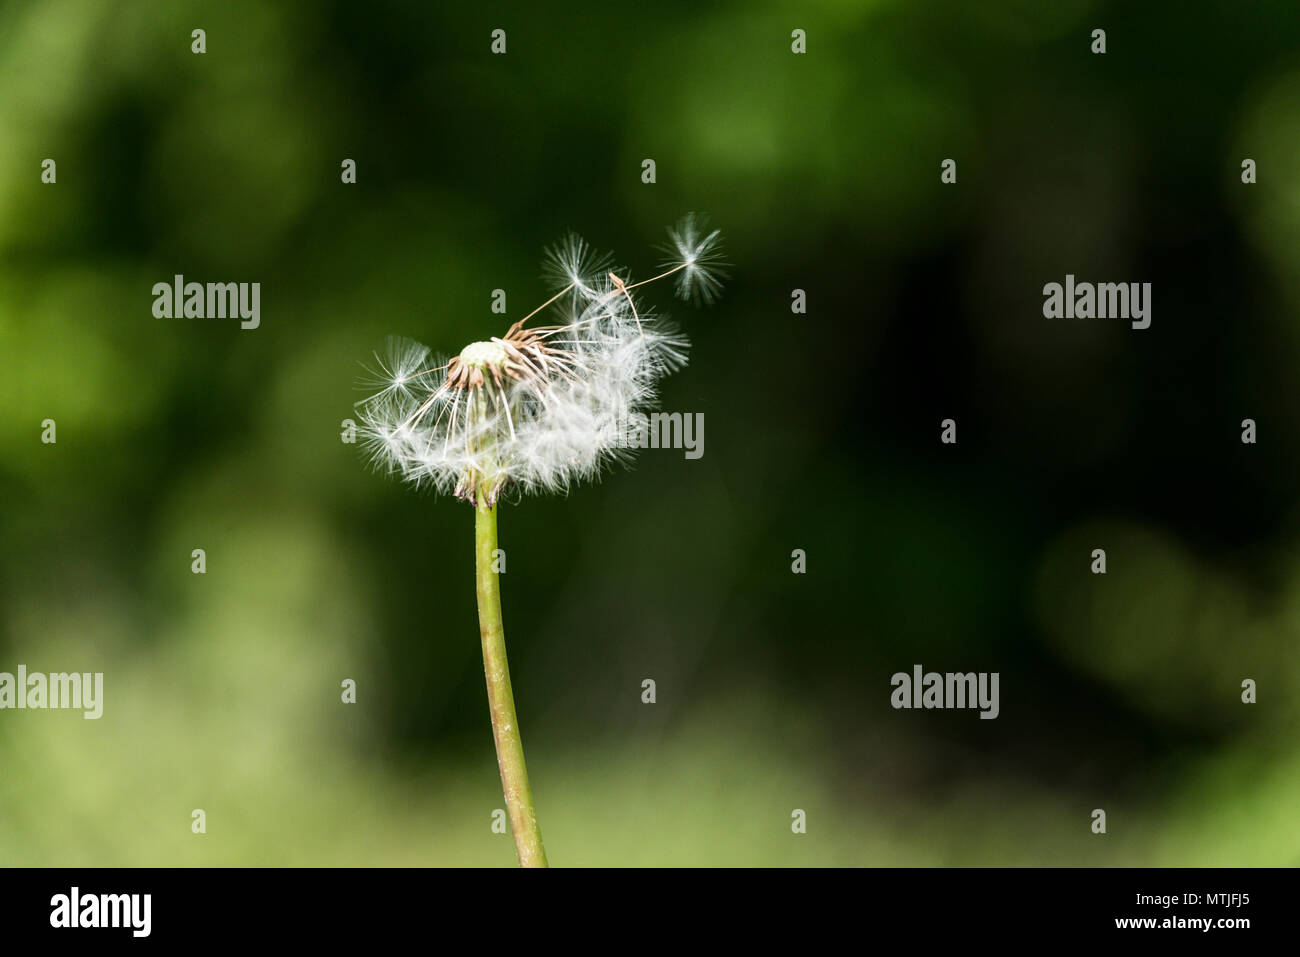 An incomplete dandelion clock (Taraxacum officinale) - Stock Image